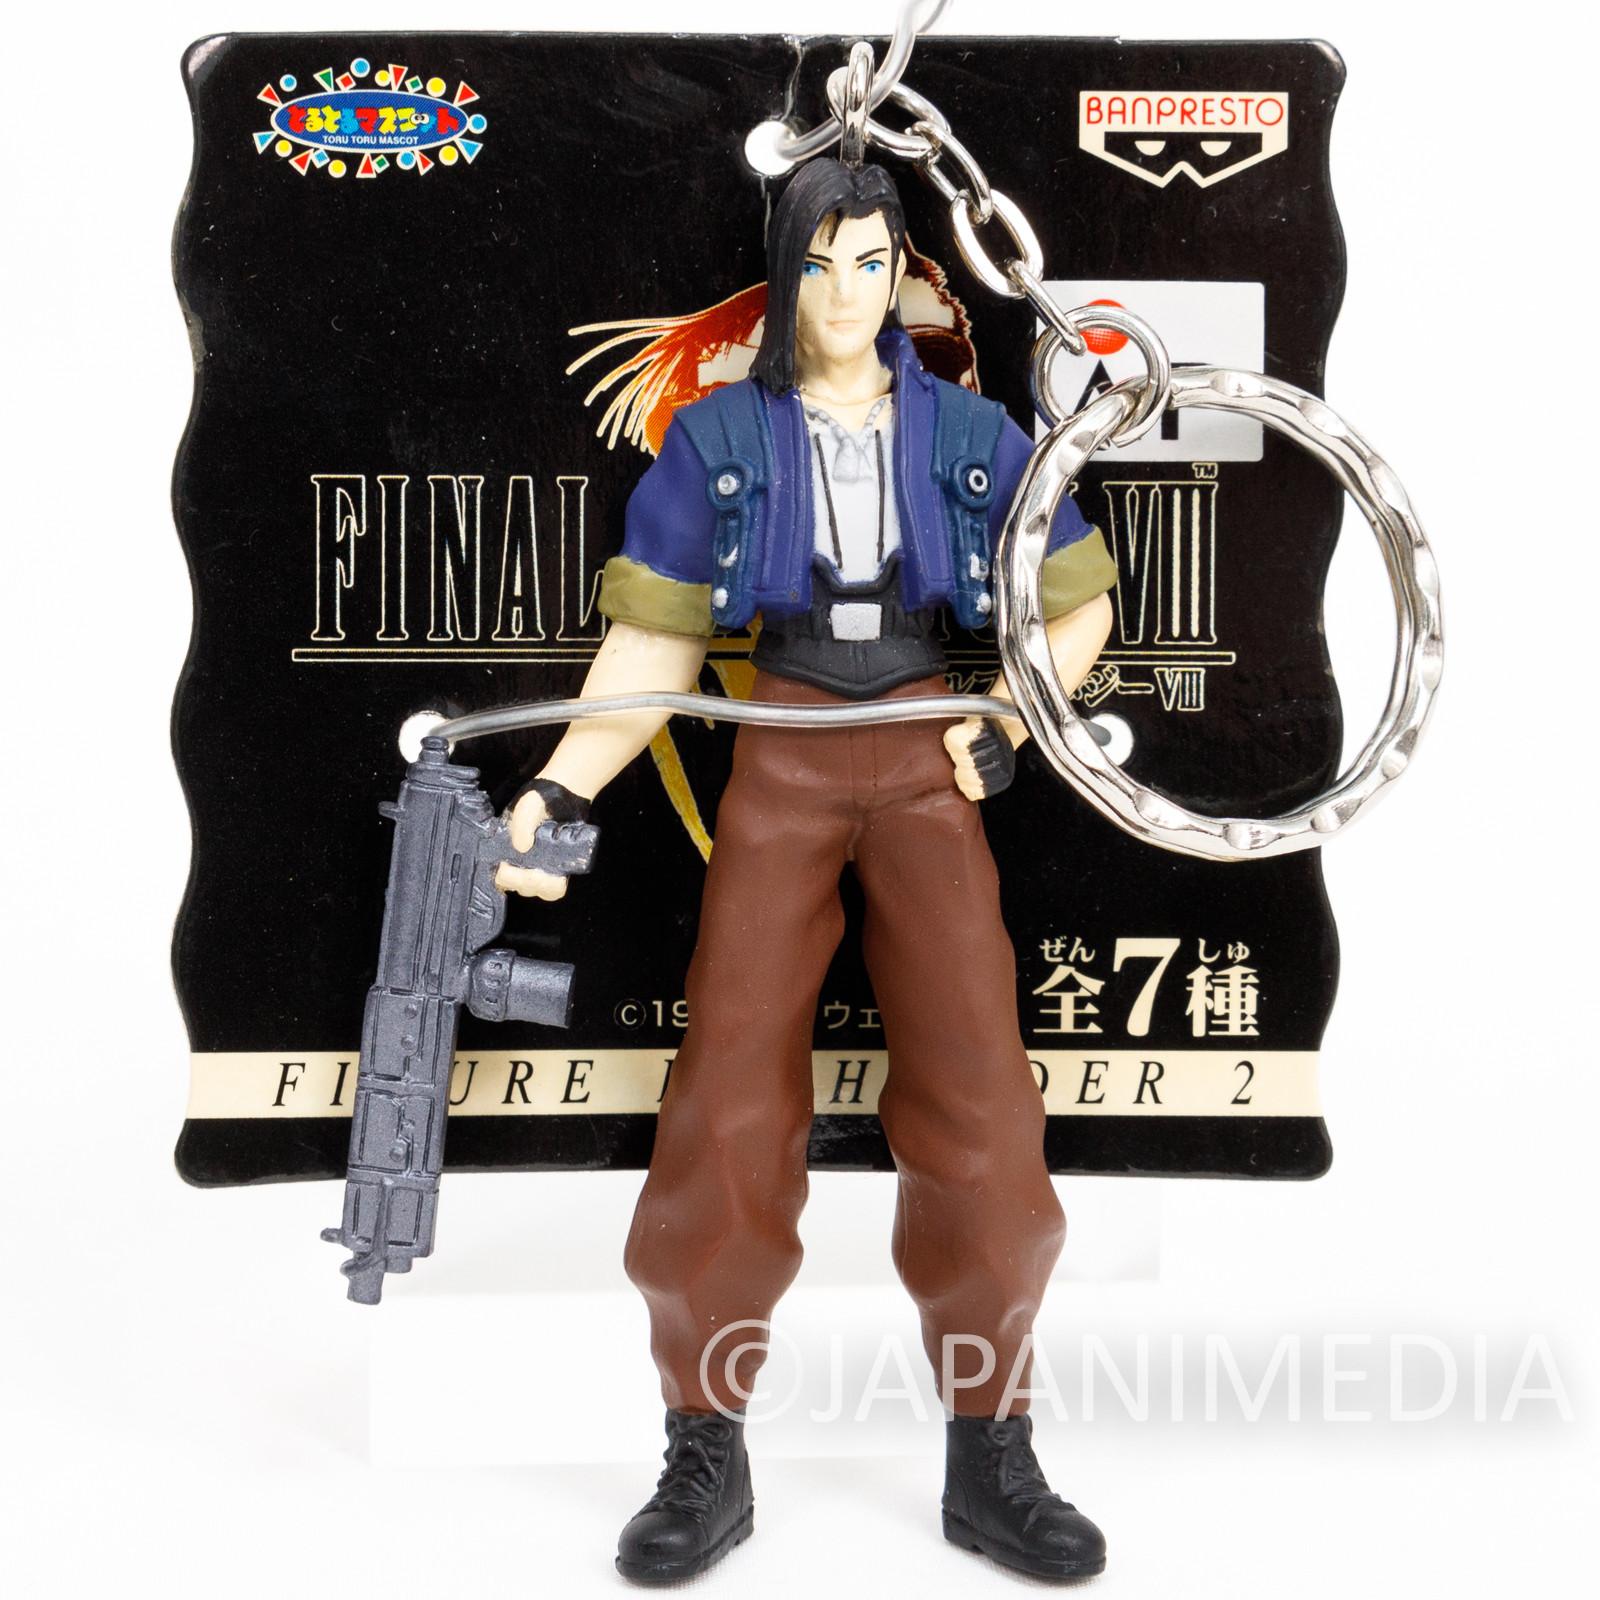 Final Fantasy VIII Laguna Loire Figure Key Chain Banpresto JAPAN SQUARE ENIX